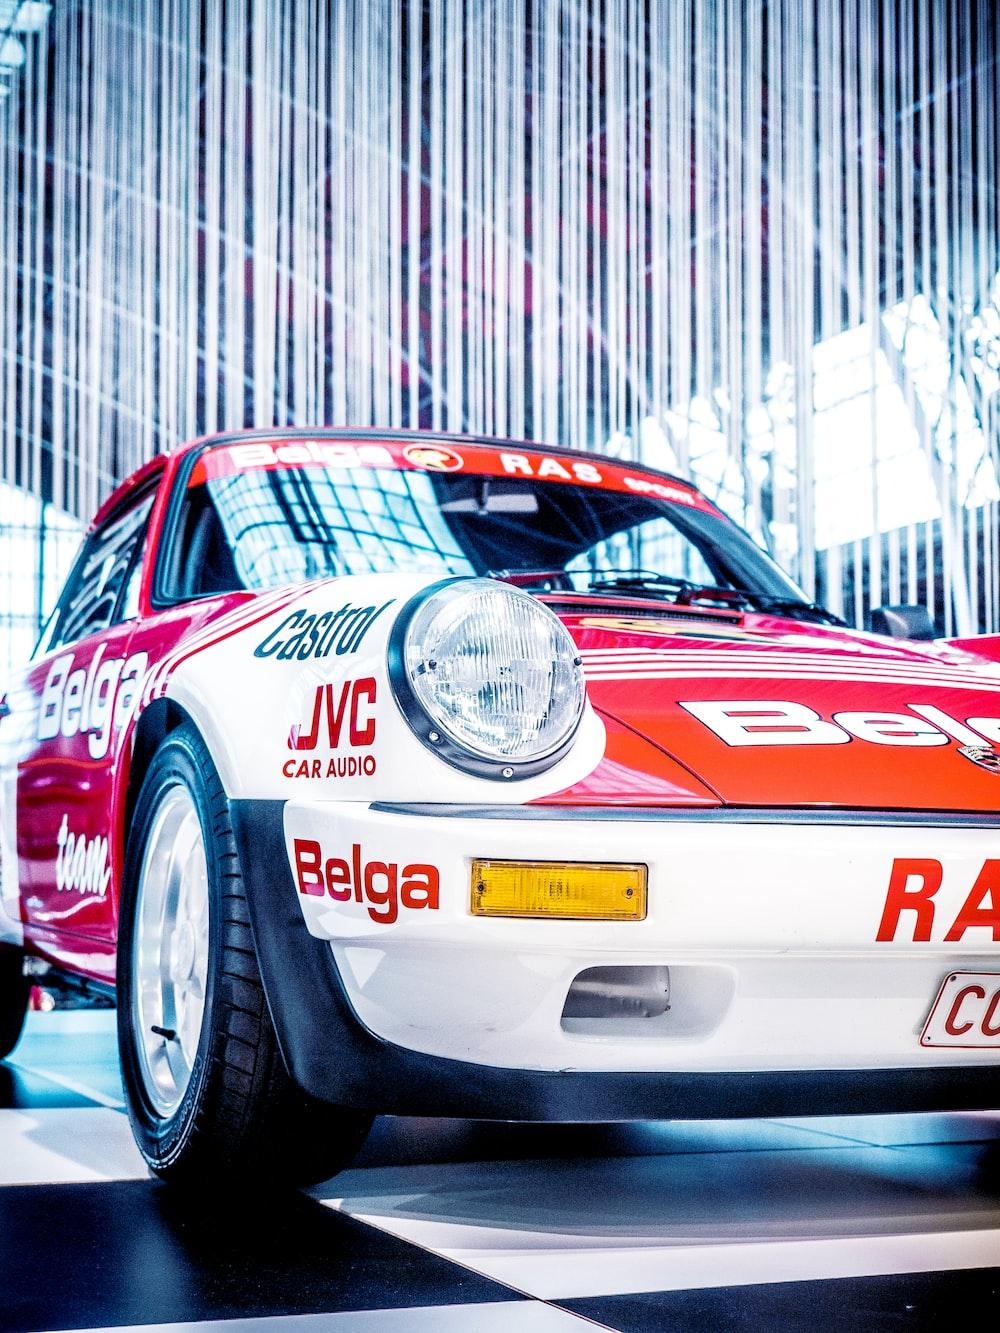 white and red Porsche 911 Turbo